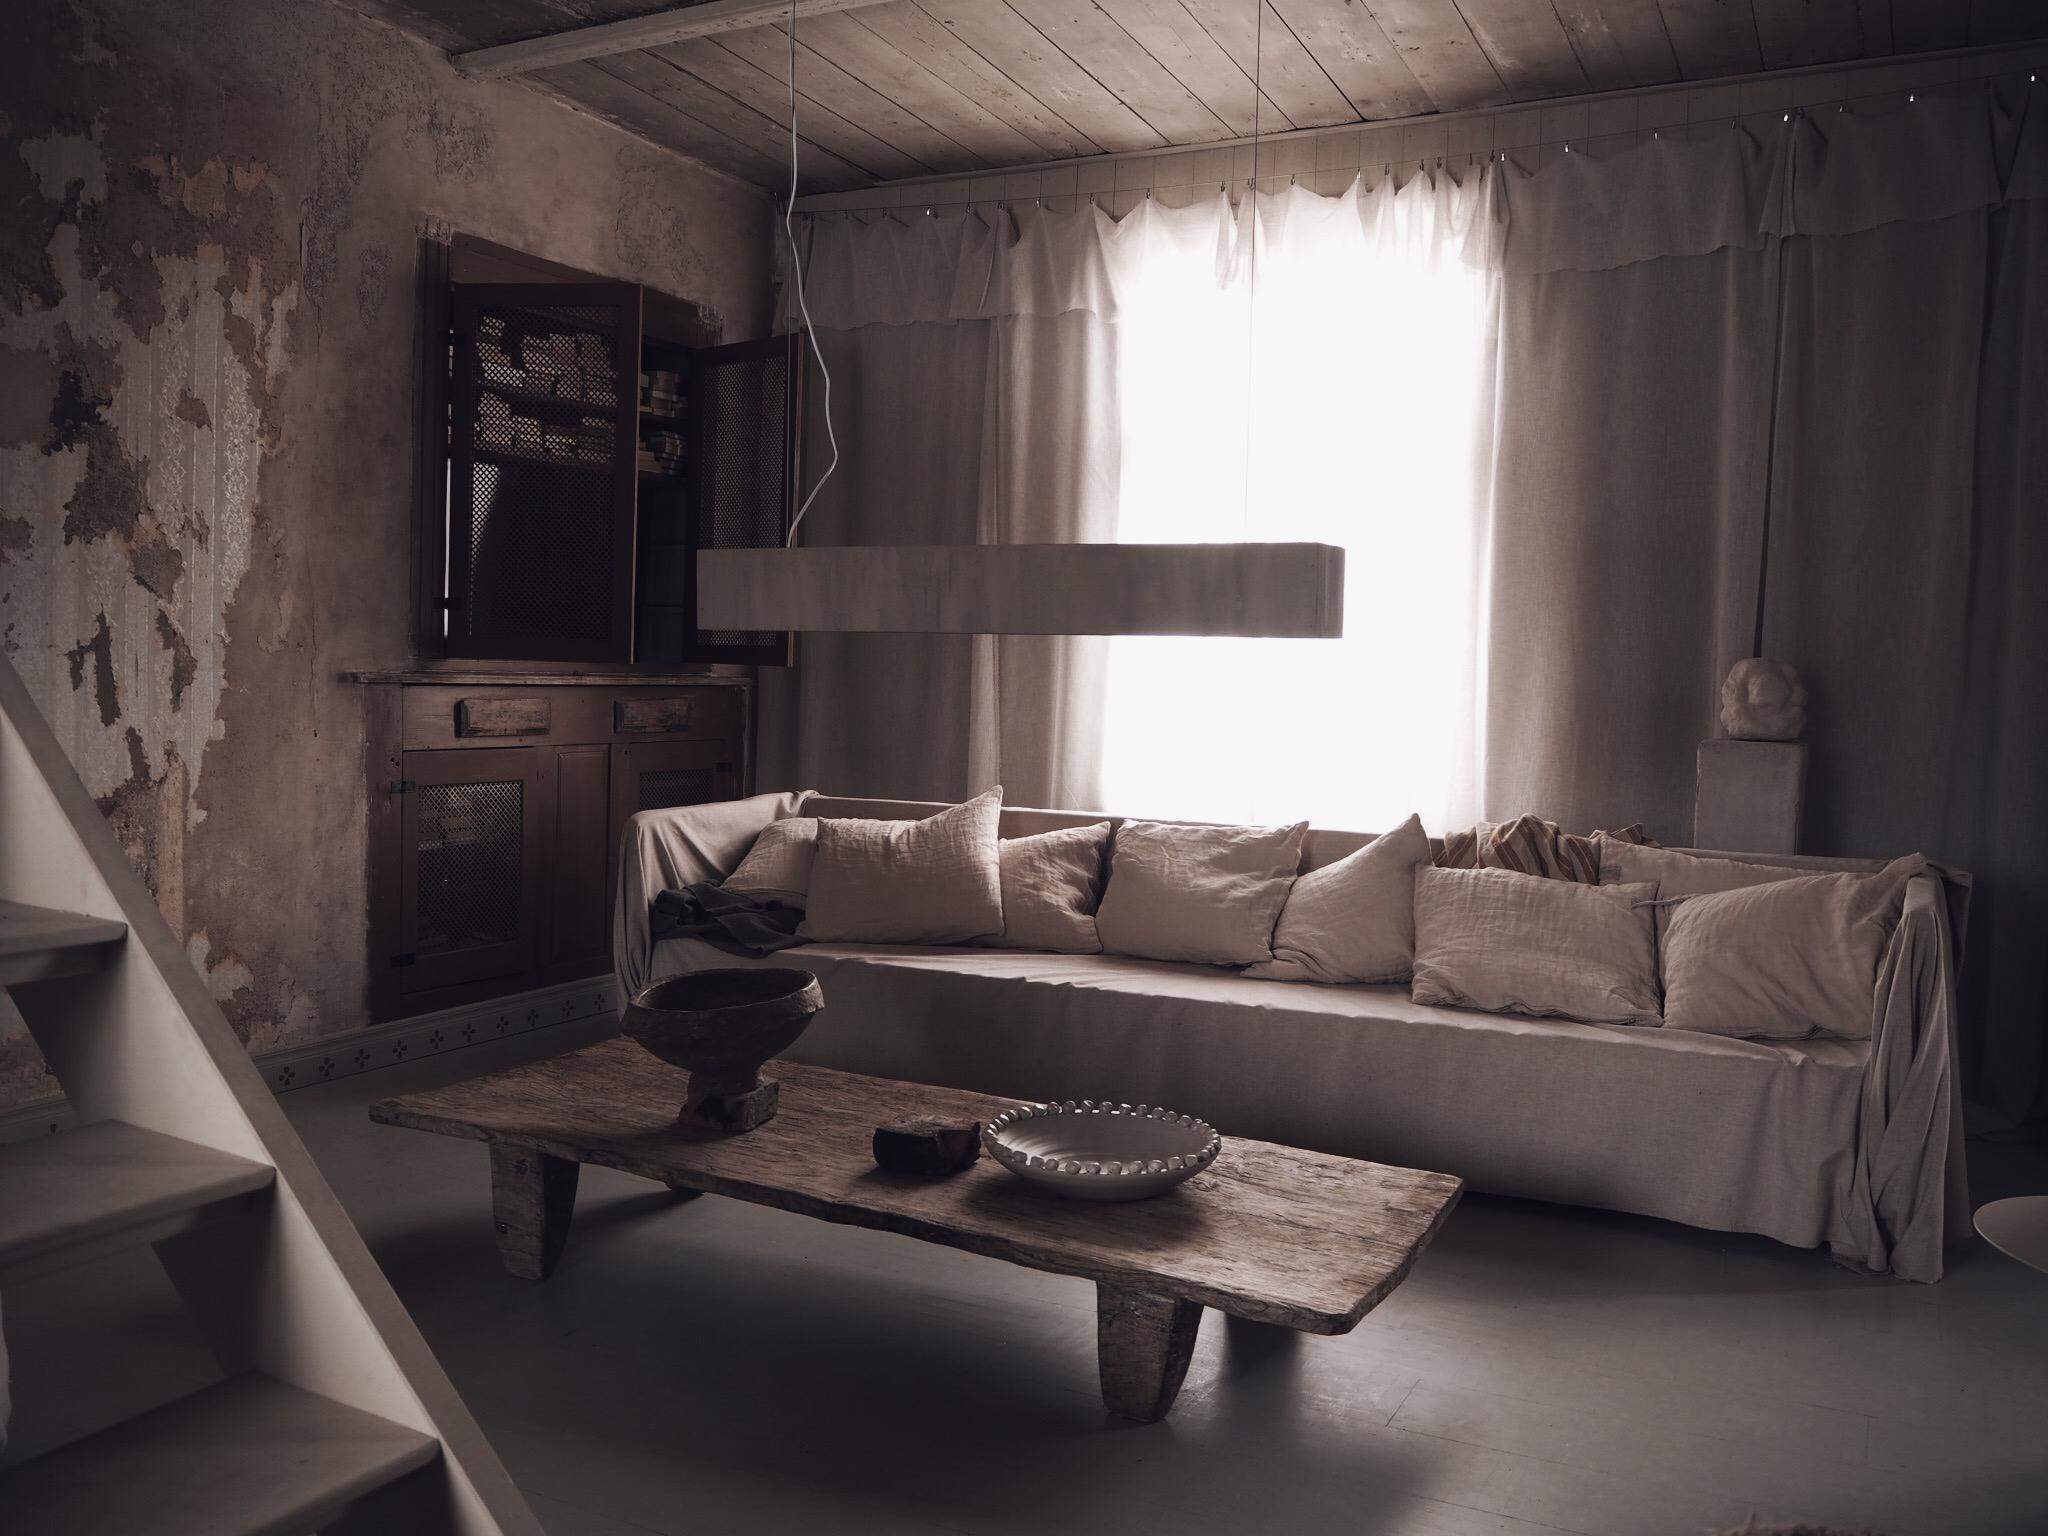 interiör inredning vardagsrum interior beige livingroom